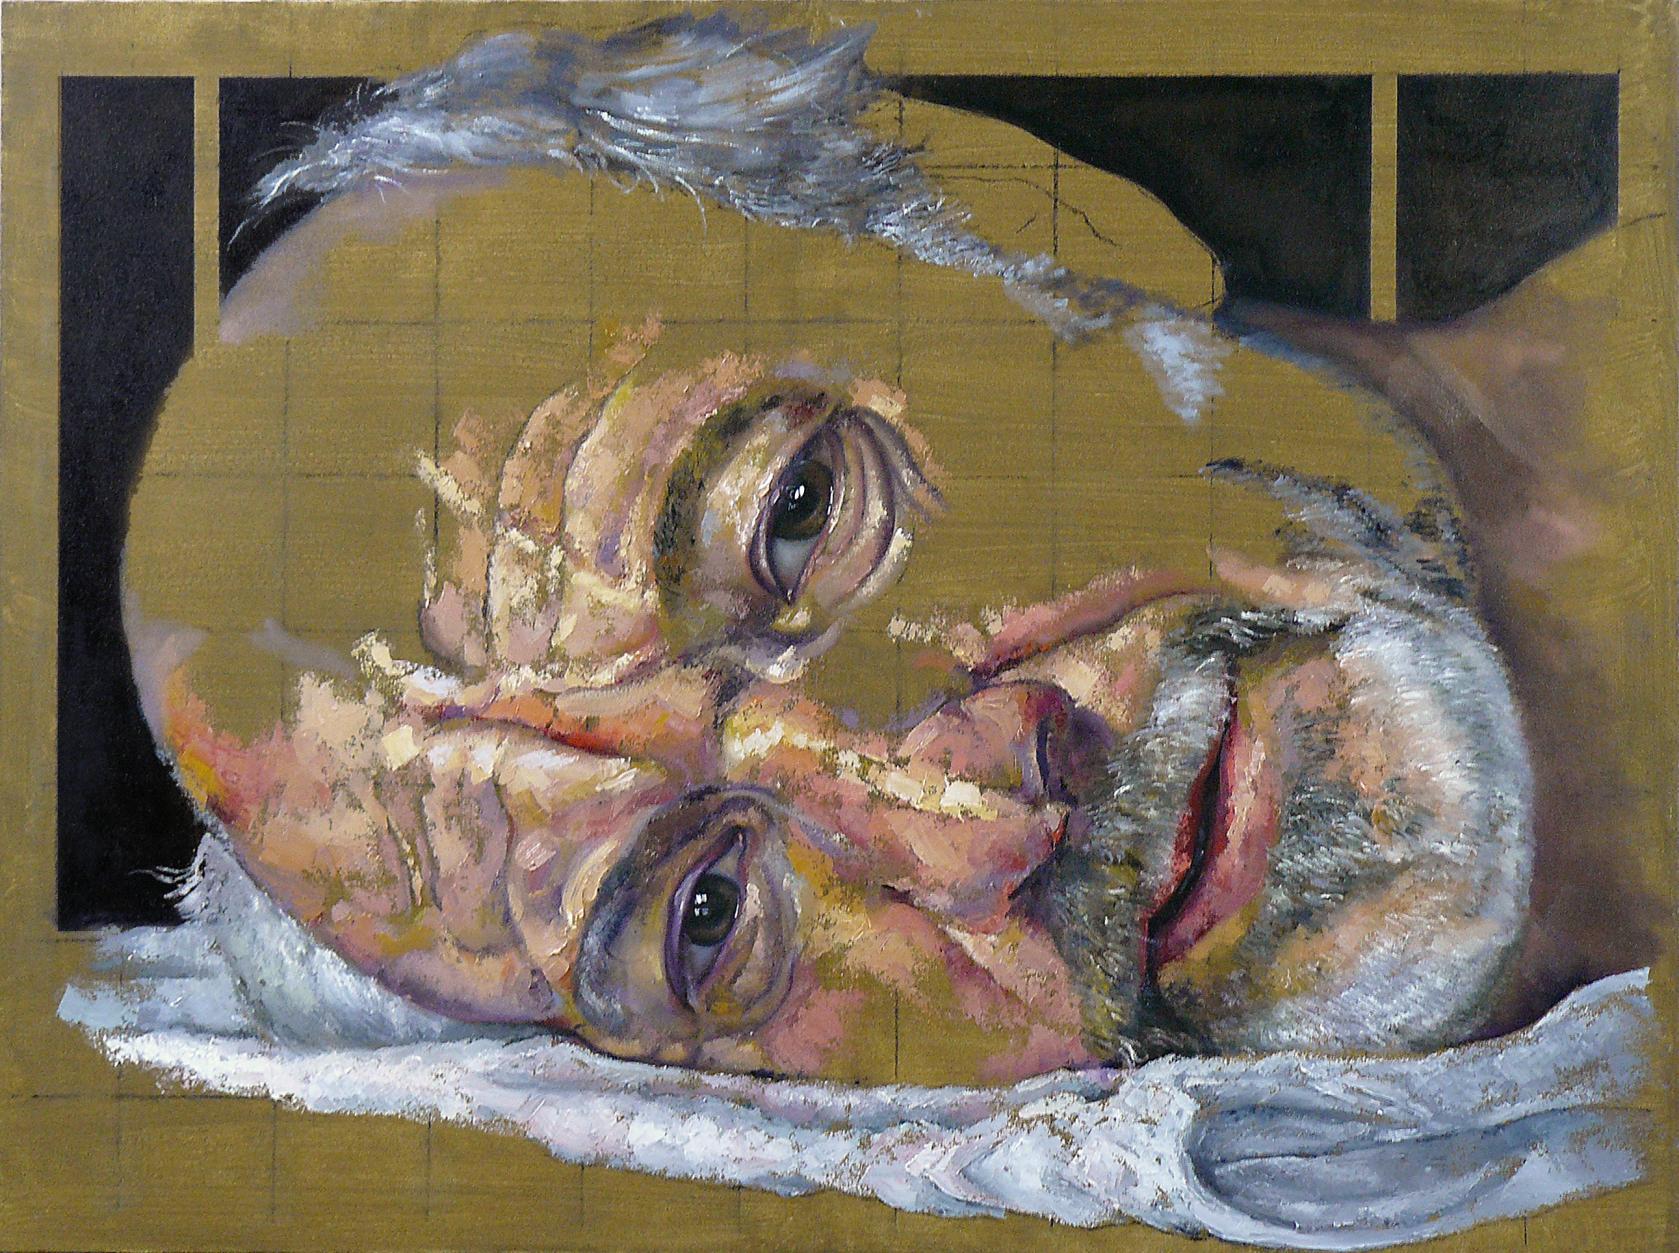 La espera (2015) - Pablo Schugurensky